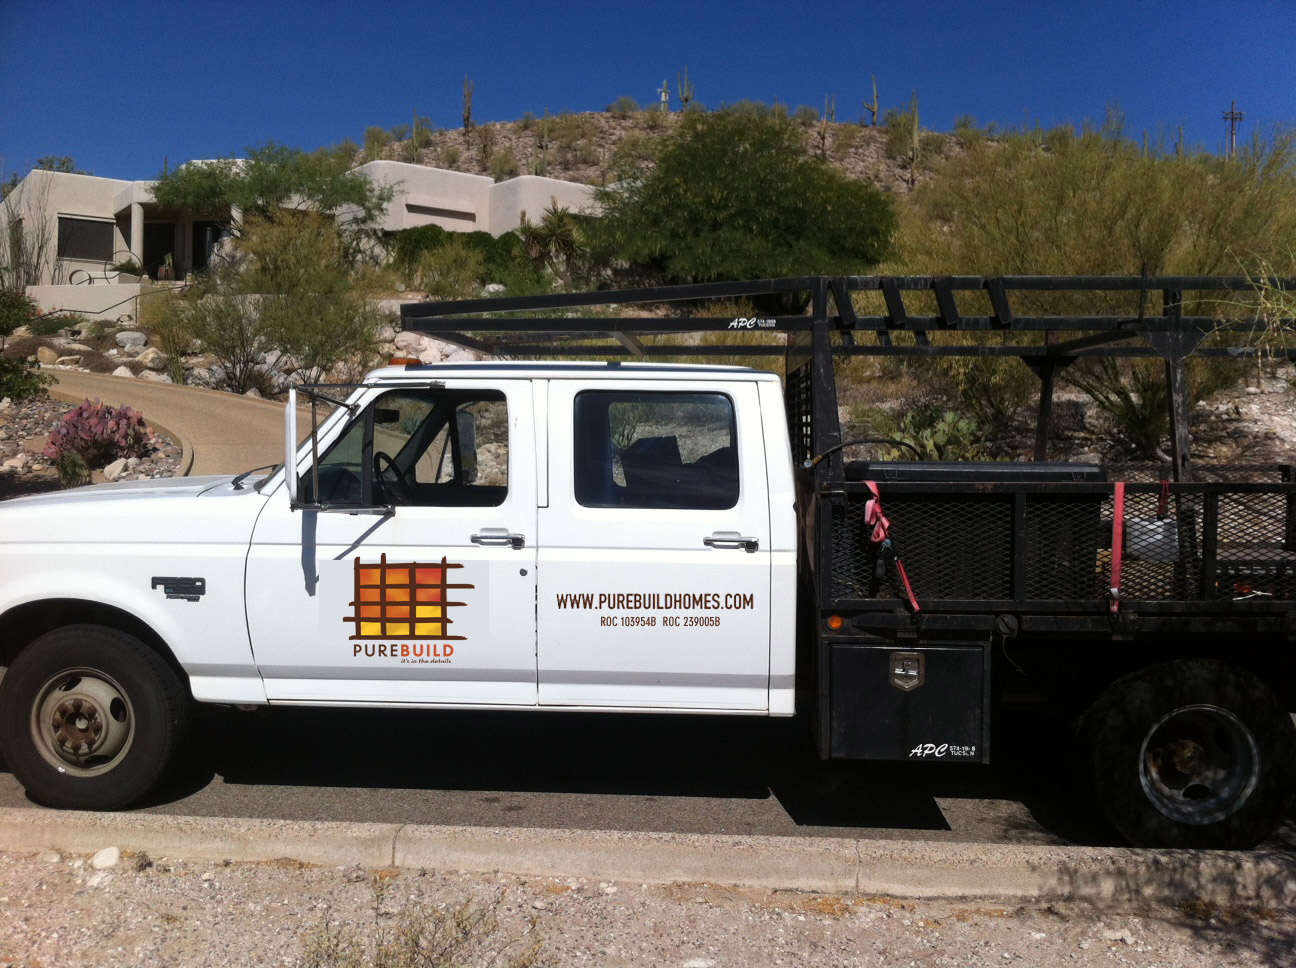 PureBuild Truck Sign layout-nobed.jpg